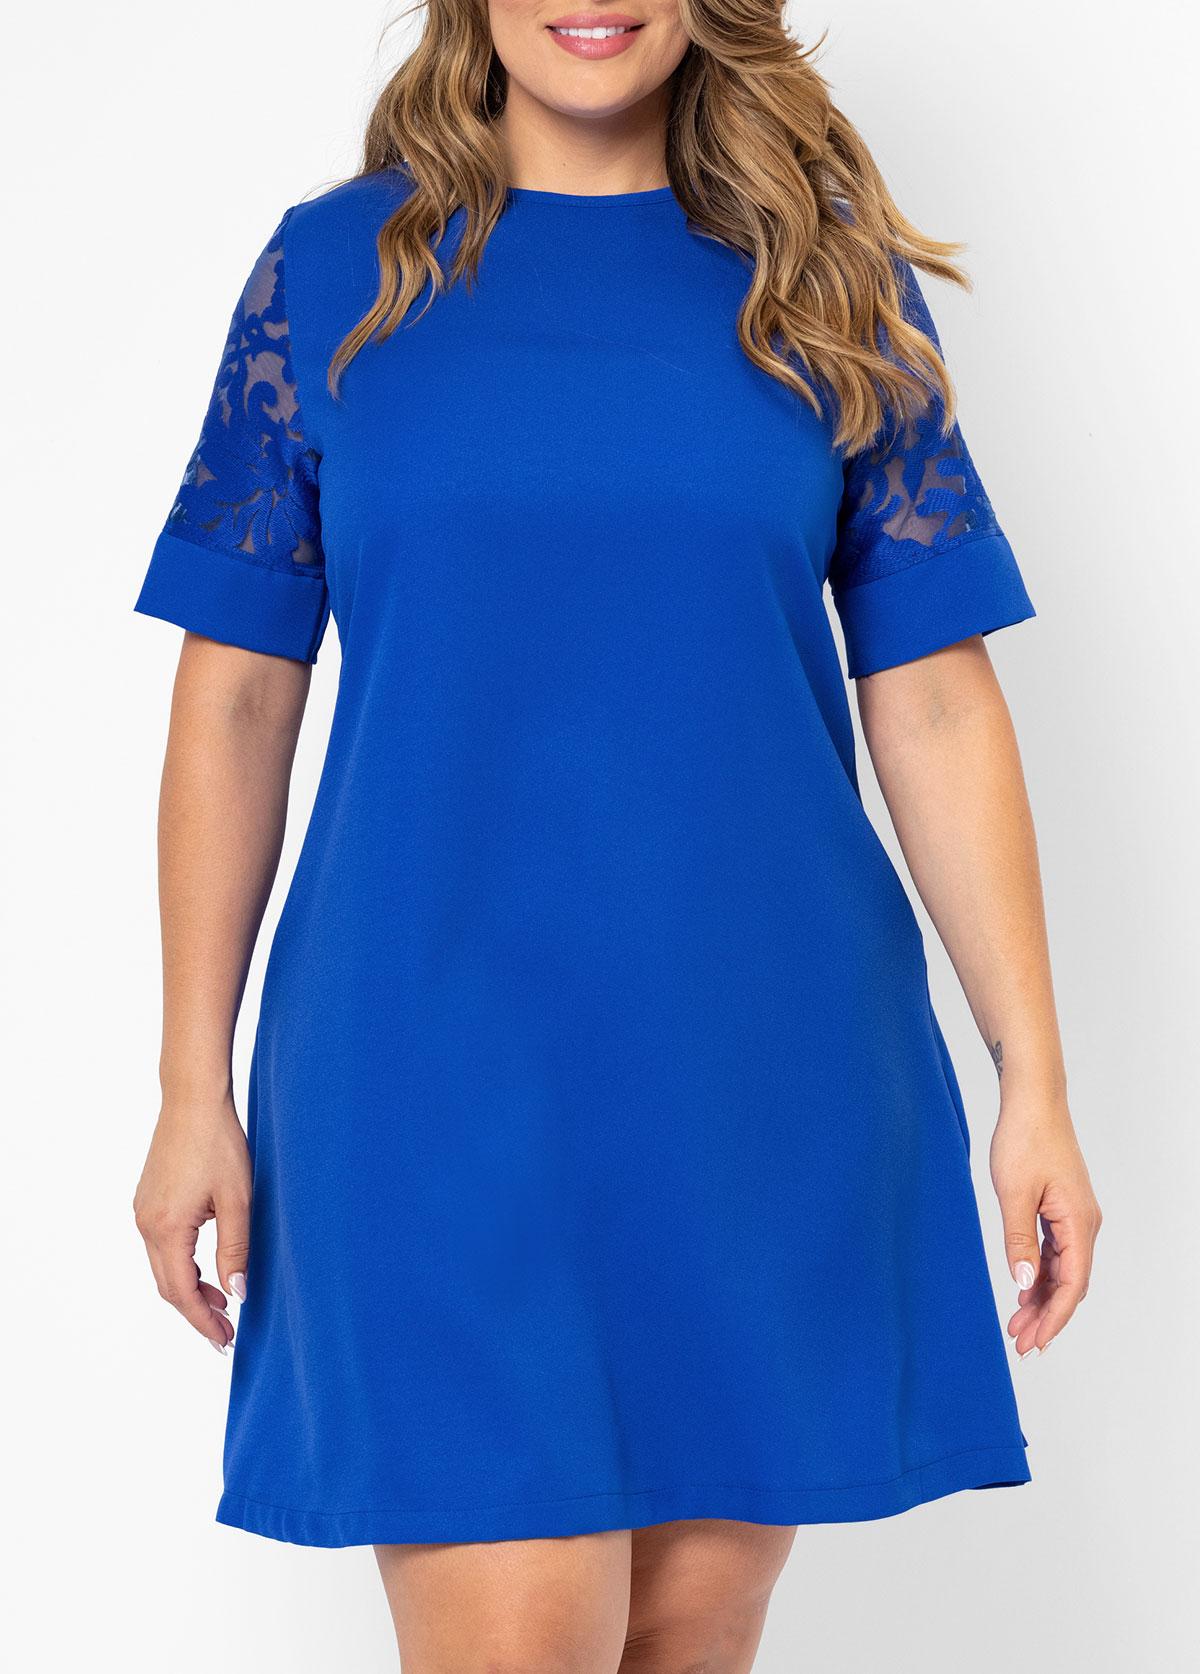 Plus Size Lace Stitching Short Sleeve Dress